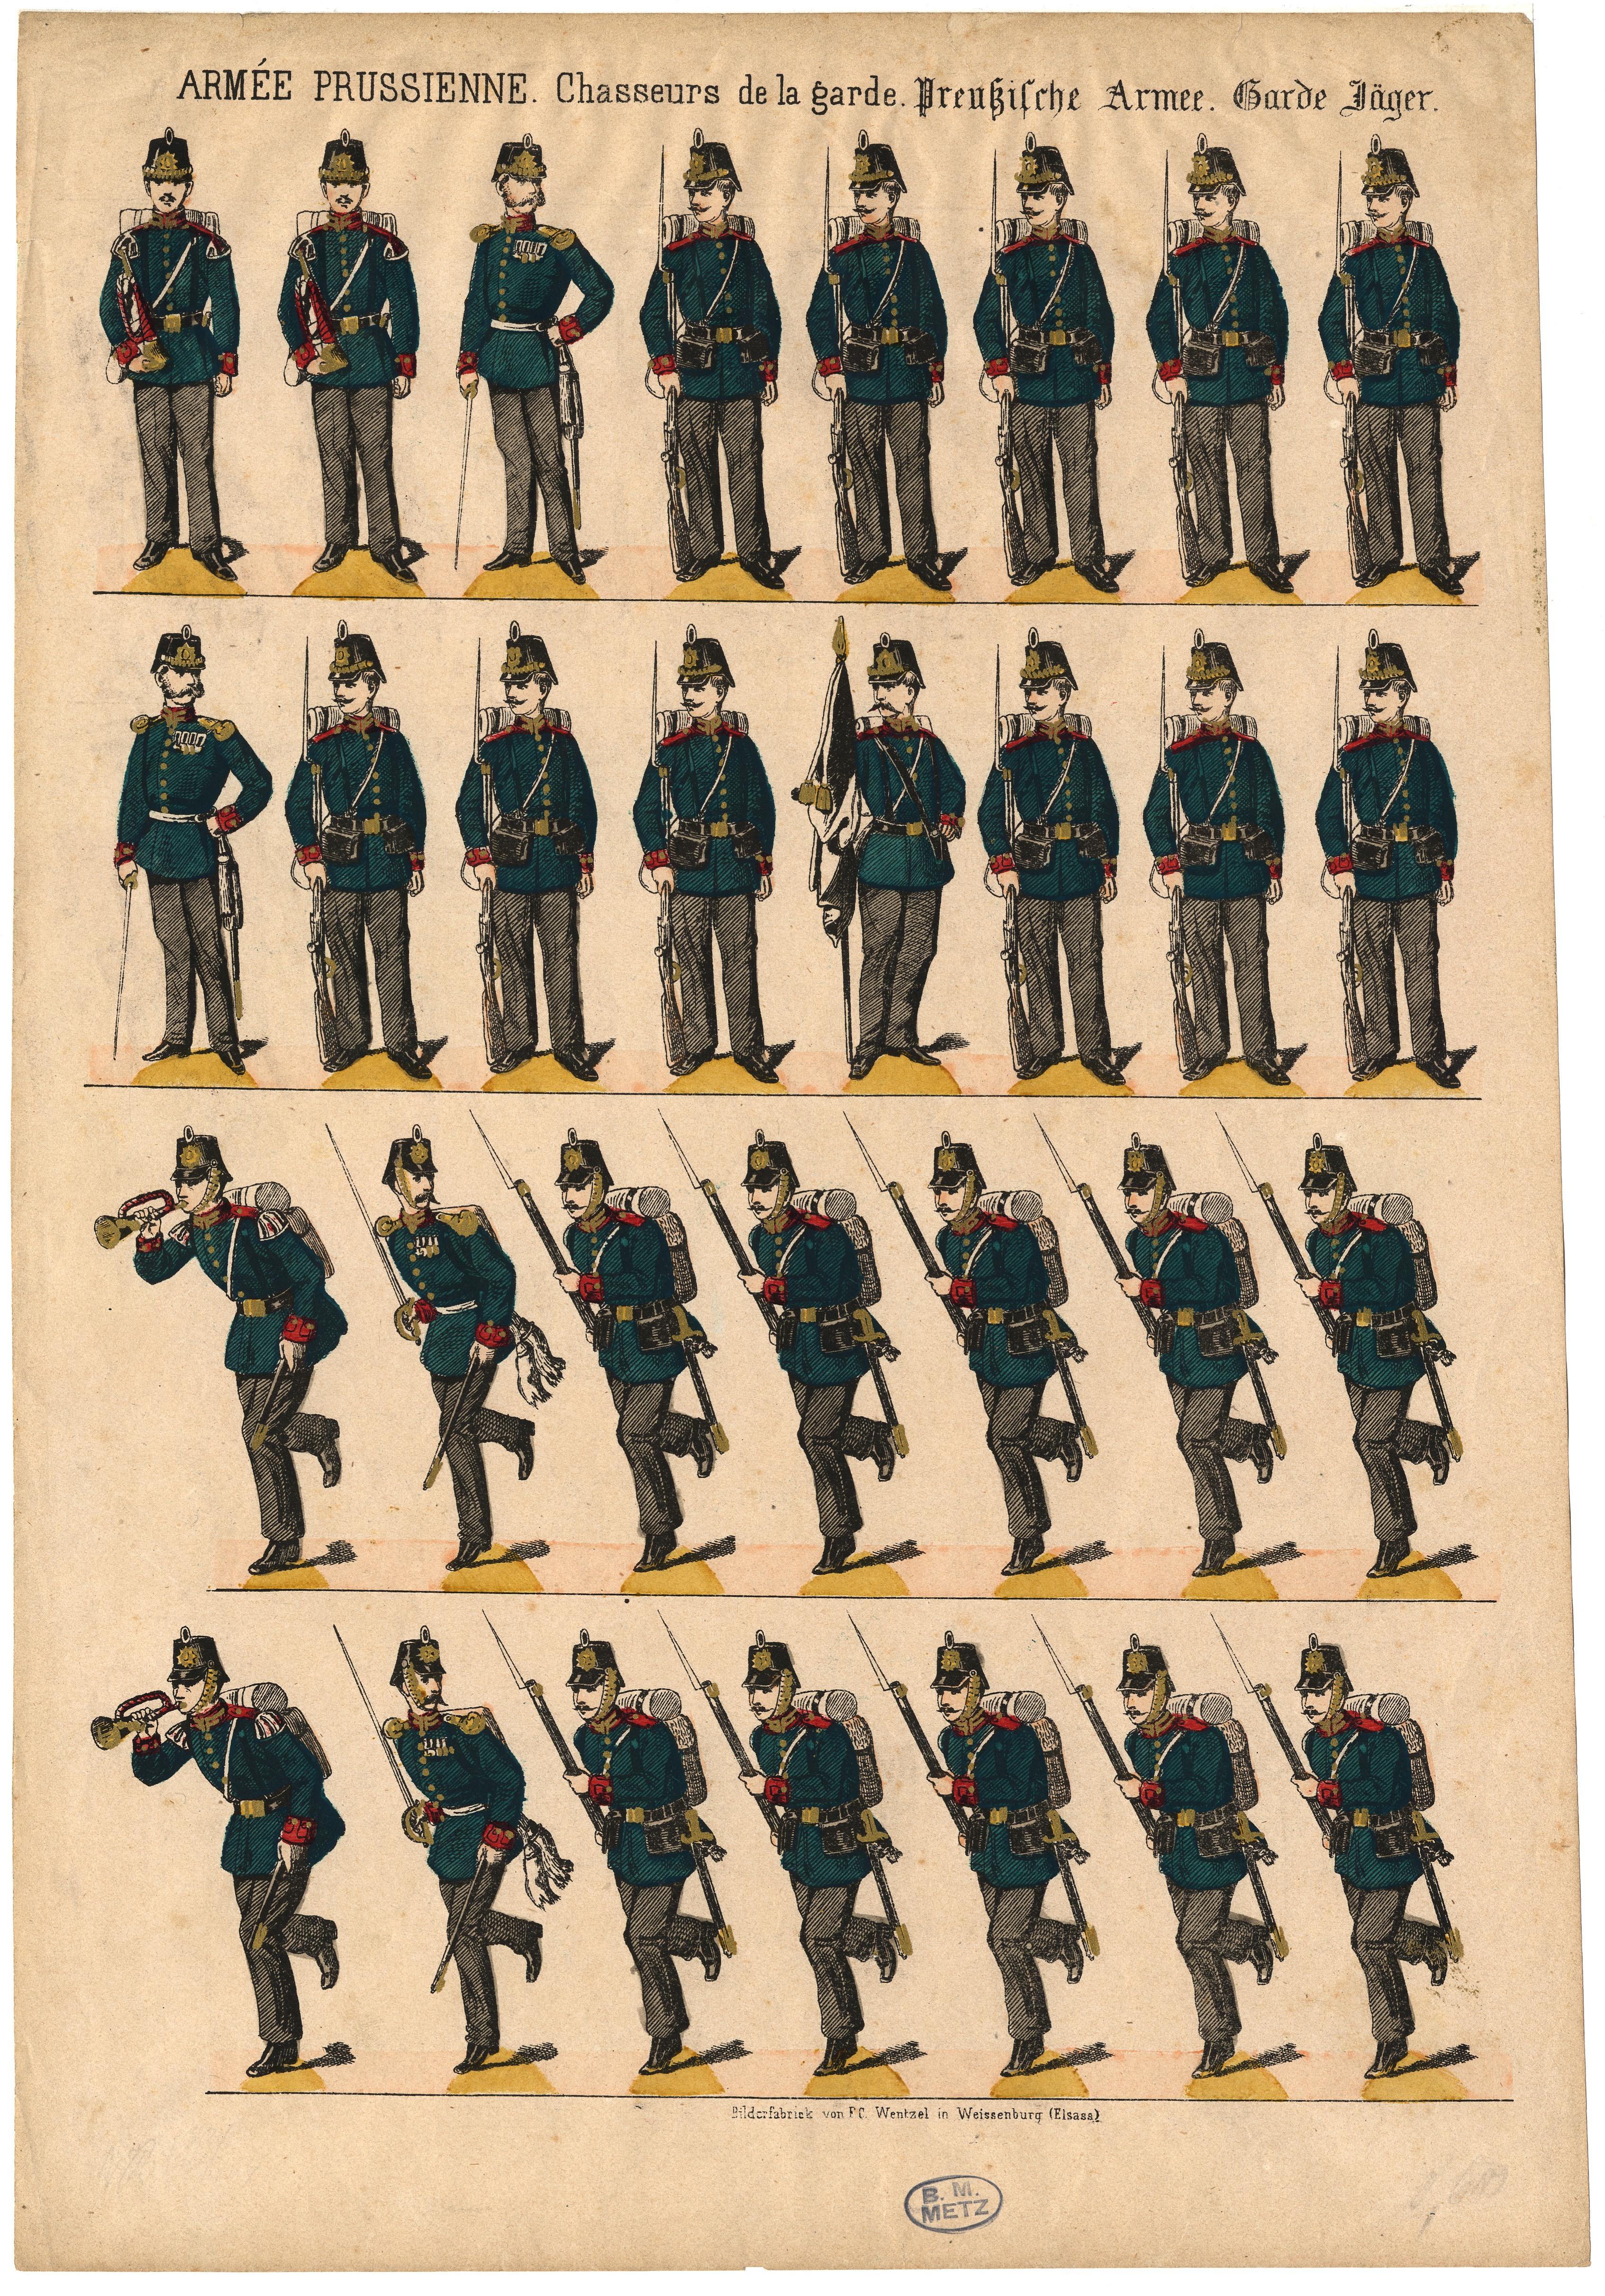 Contenu du Armée prussienne. Chasseurs de la garde – Preussische Armee. Garde Jäger